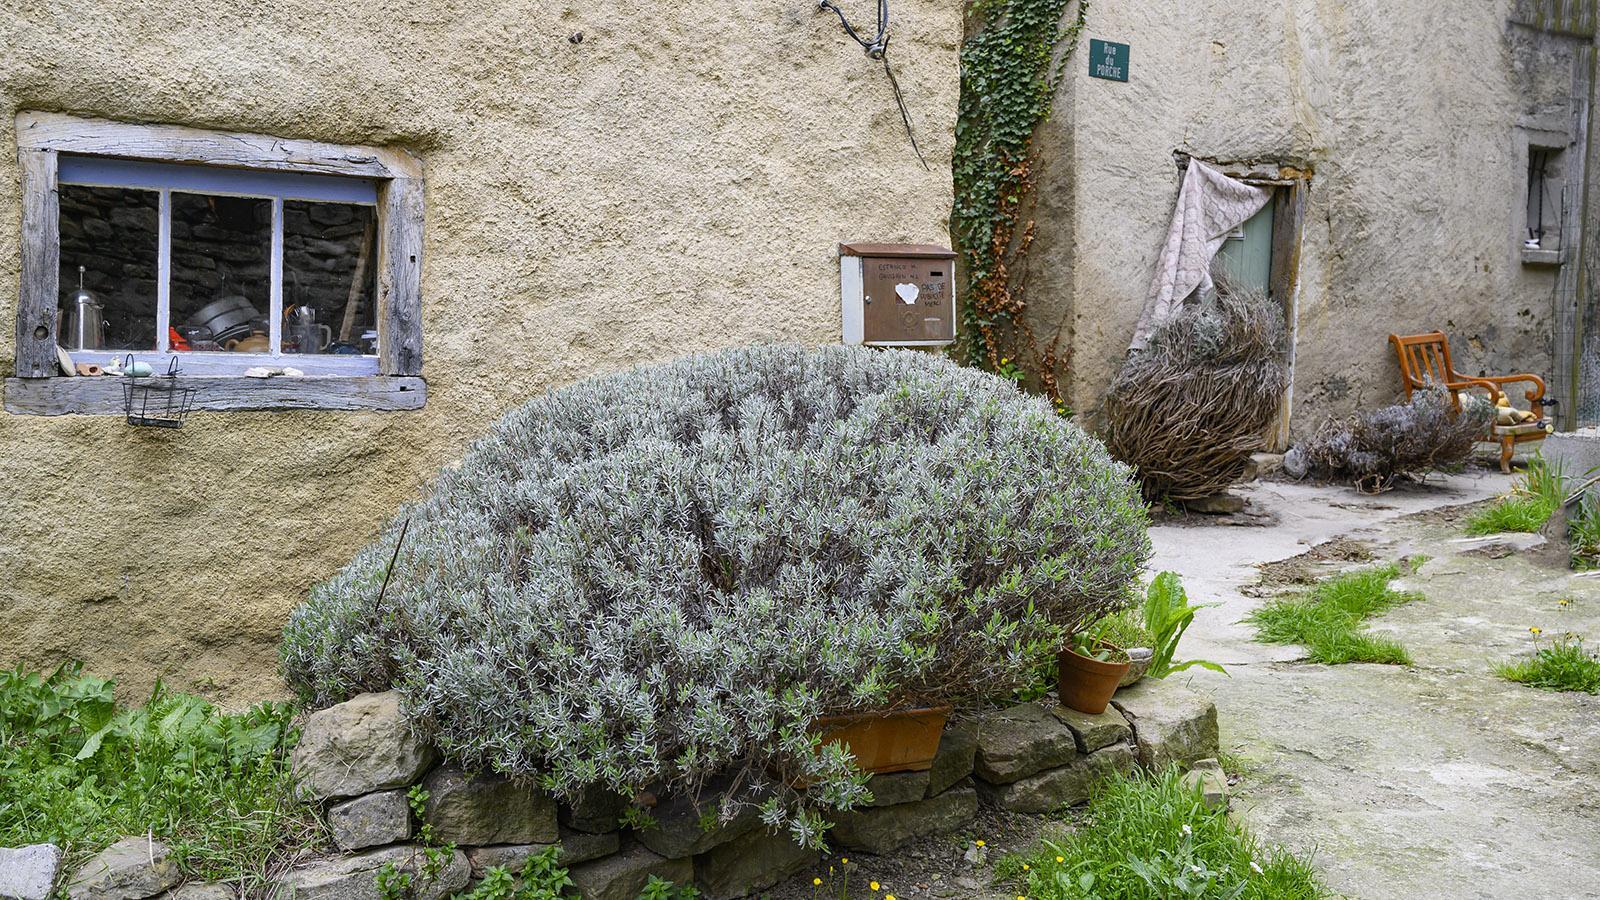 La Serpent: Lavendel in XXL schmückt dieses Haus. Foto: Hilke Maunder